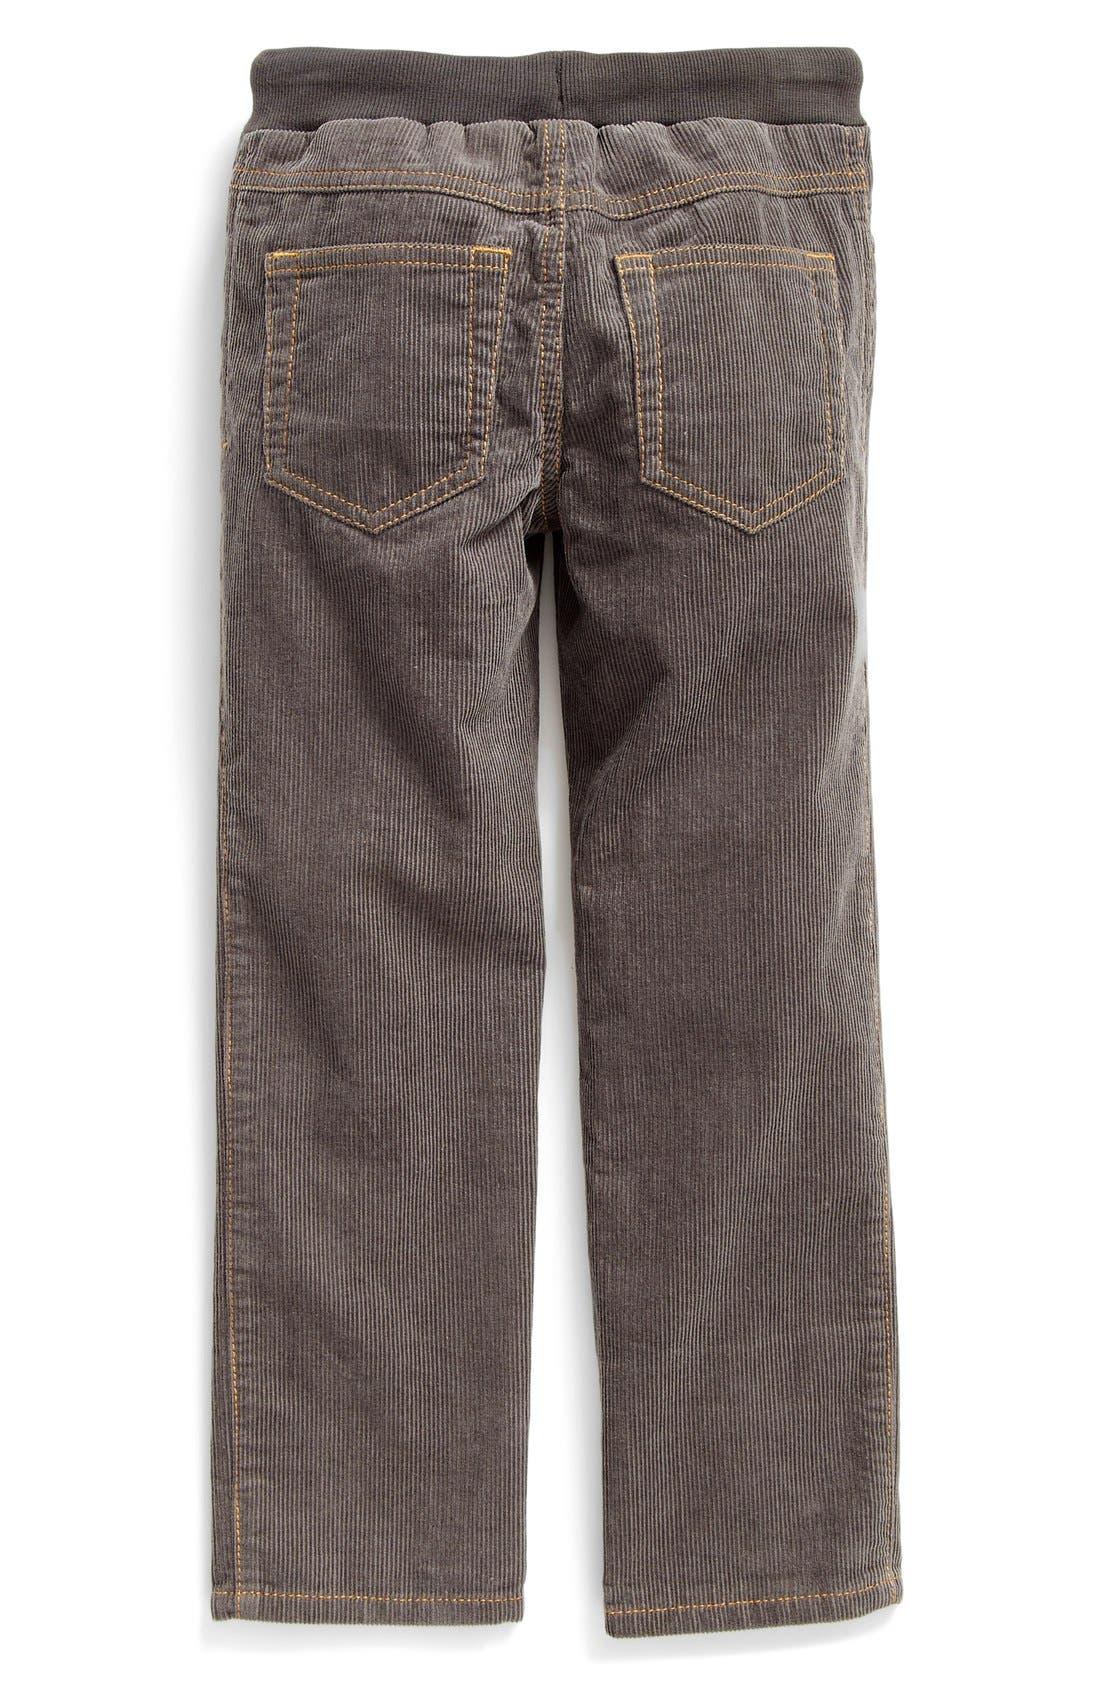 Alternate Image 2  - Tucker + Tate Corduroy Pants (Toddler Boys & Little Boys)